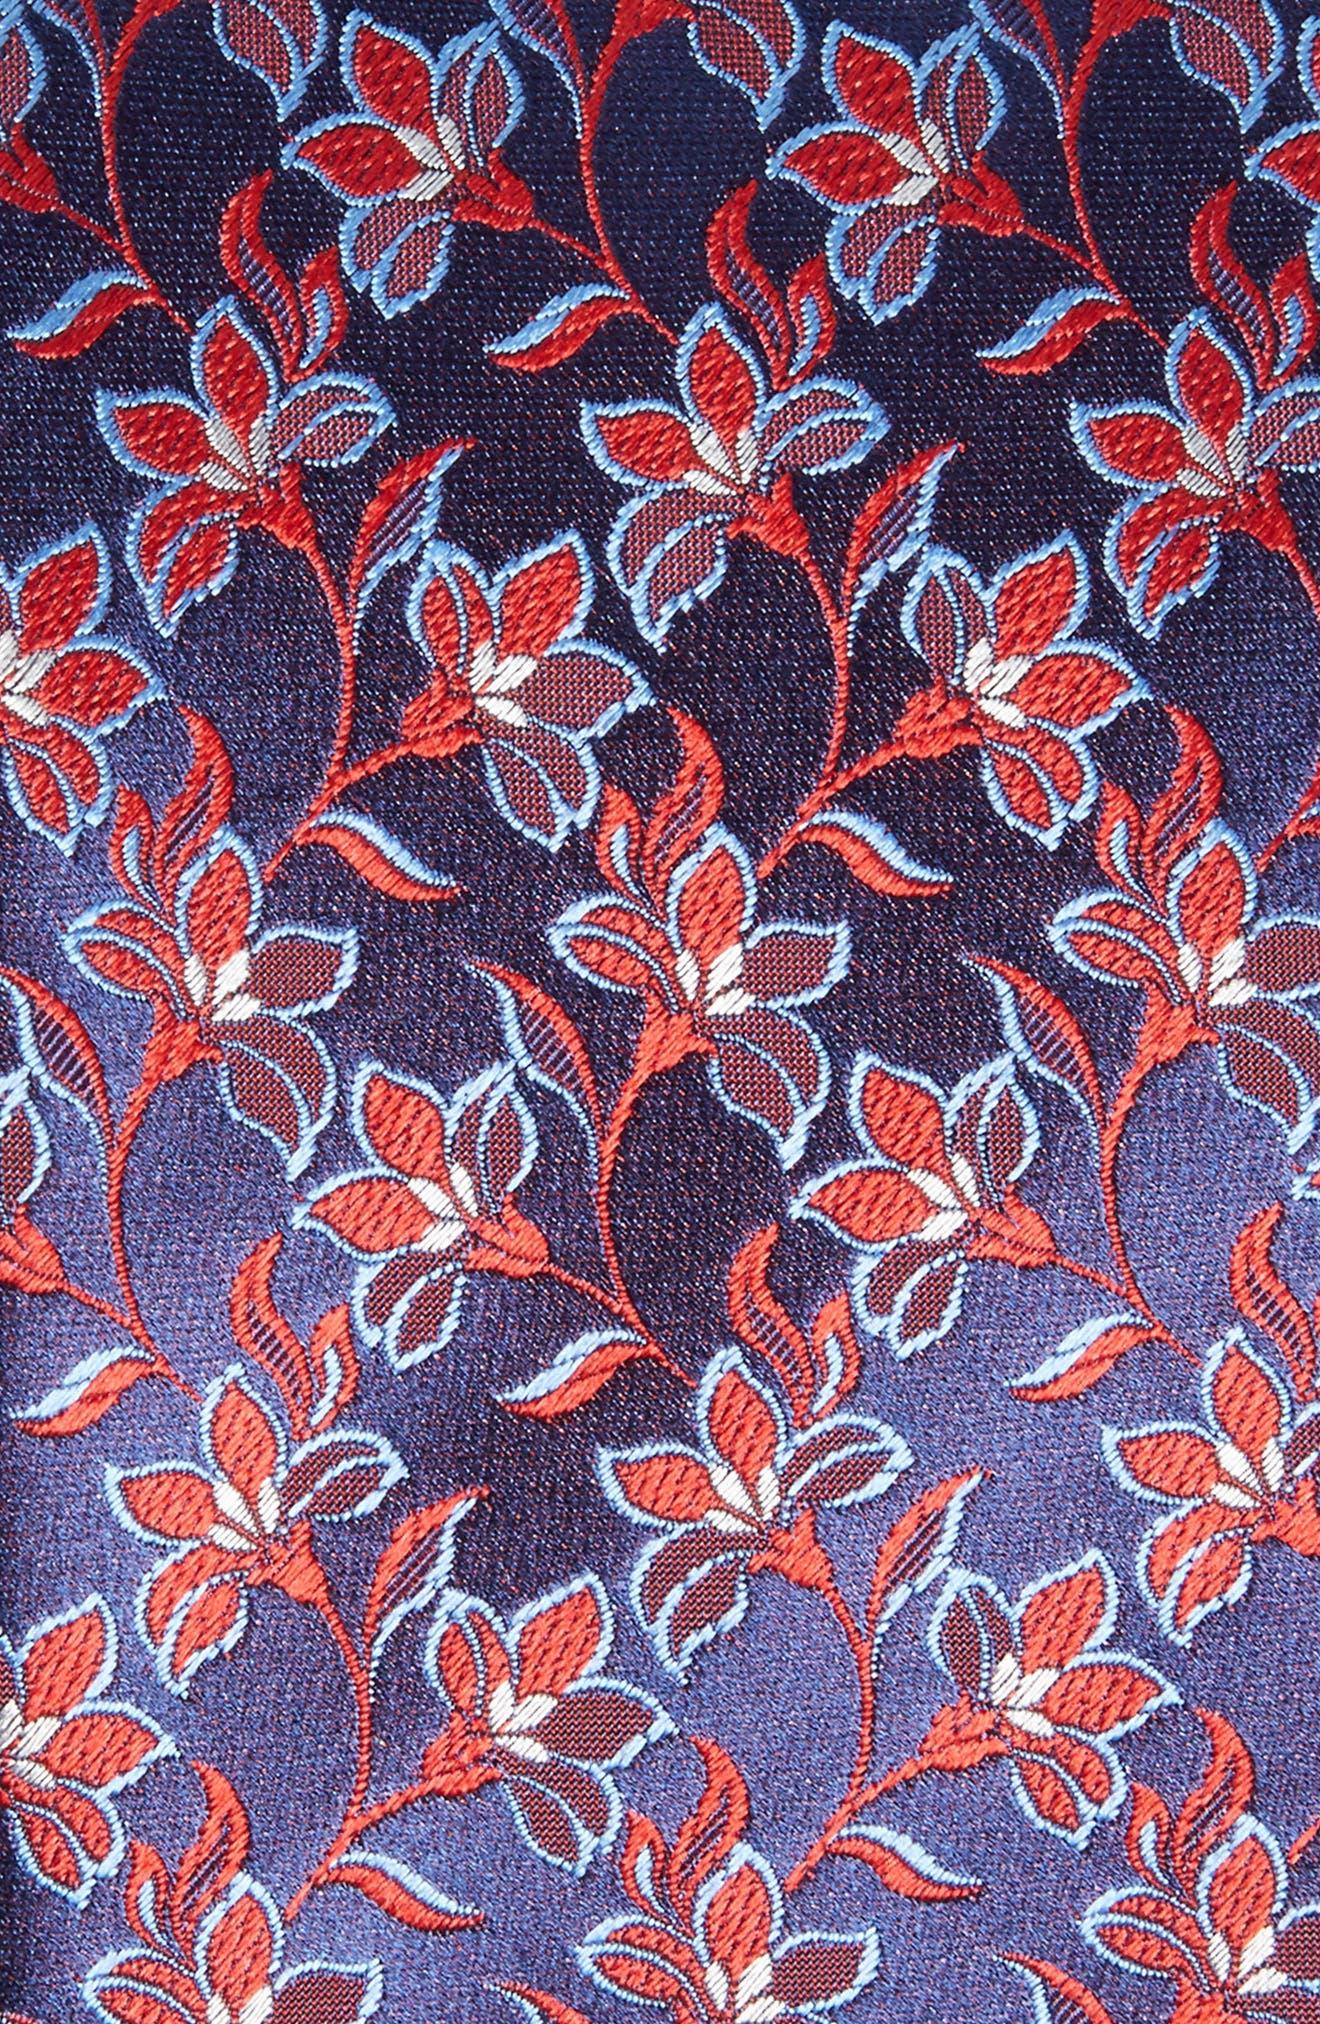 Floral Silk Tie,                             Alternate thumbnail 2, color,                             401